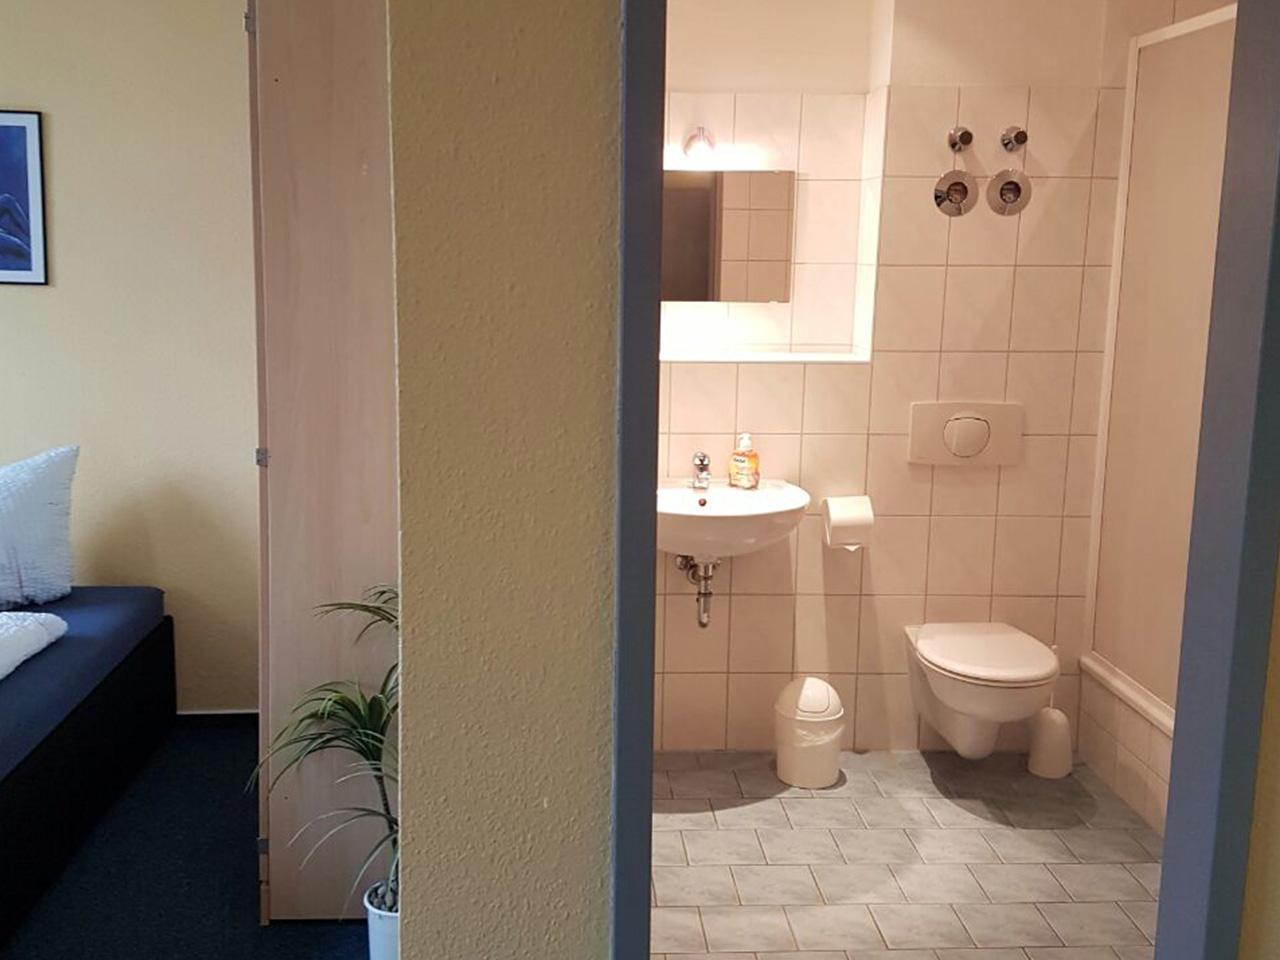 pension hanse haus service gmbh greifswald. Black Bedroom Furniture Sets. Home Design Ideas